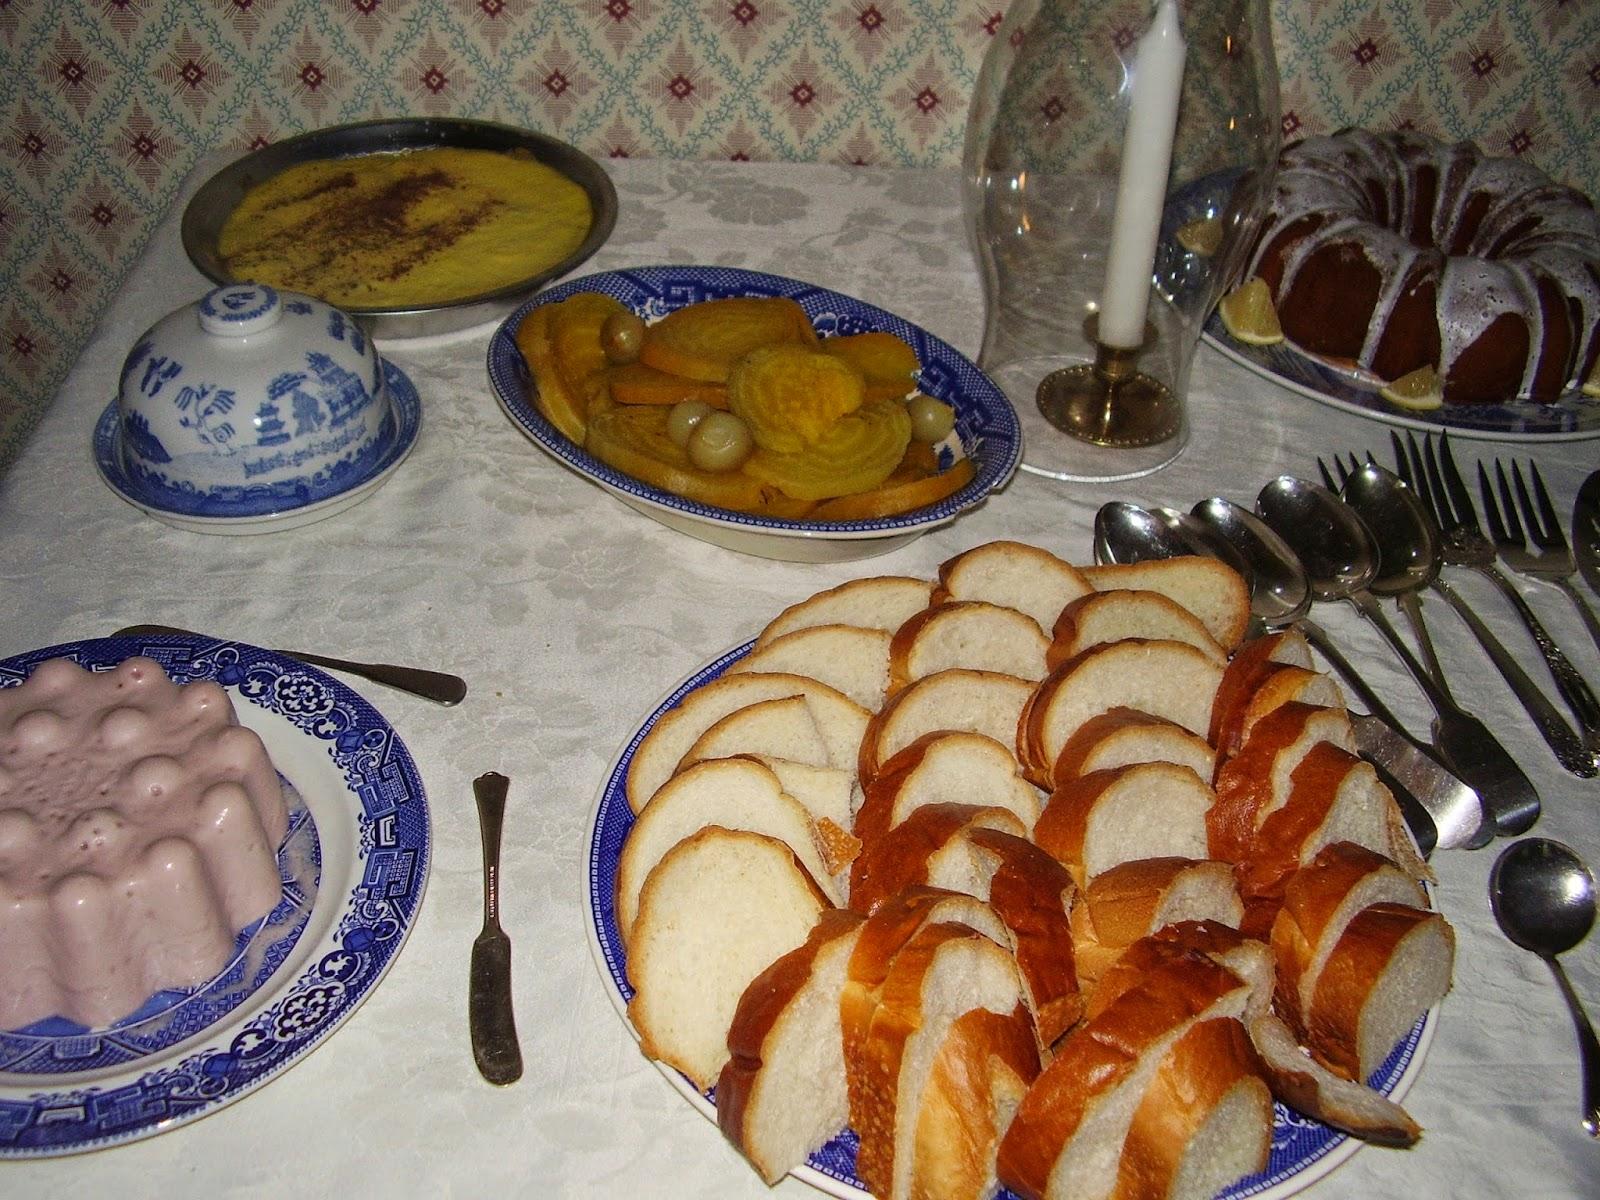 Side board with dishes: raspberry cream, apple custard, lemon cake.